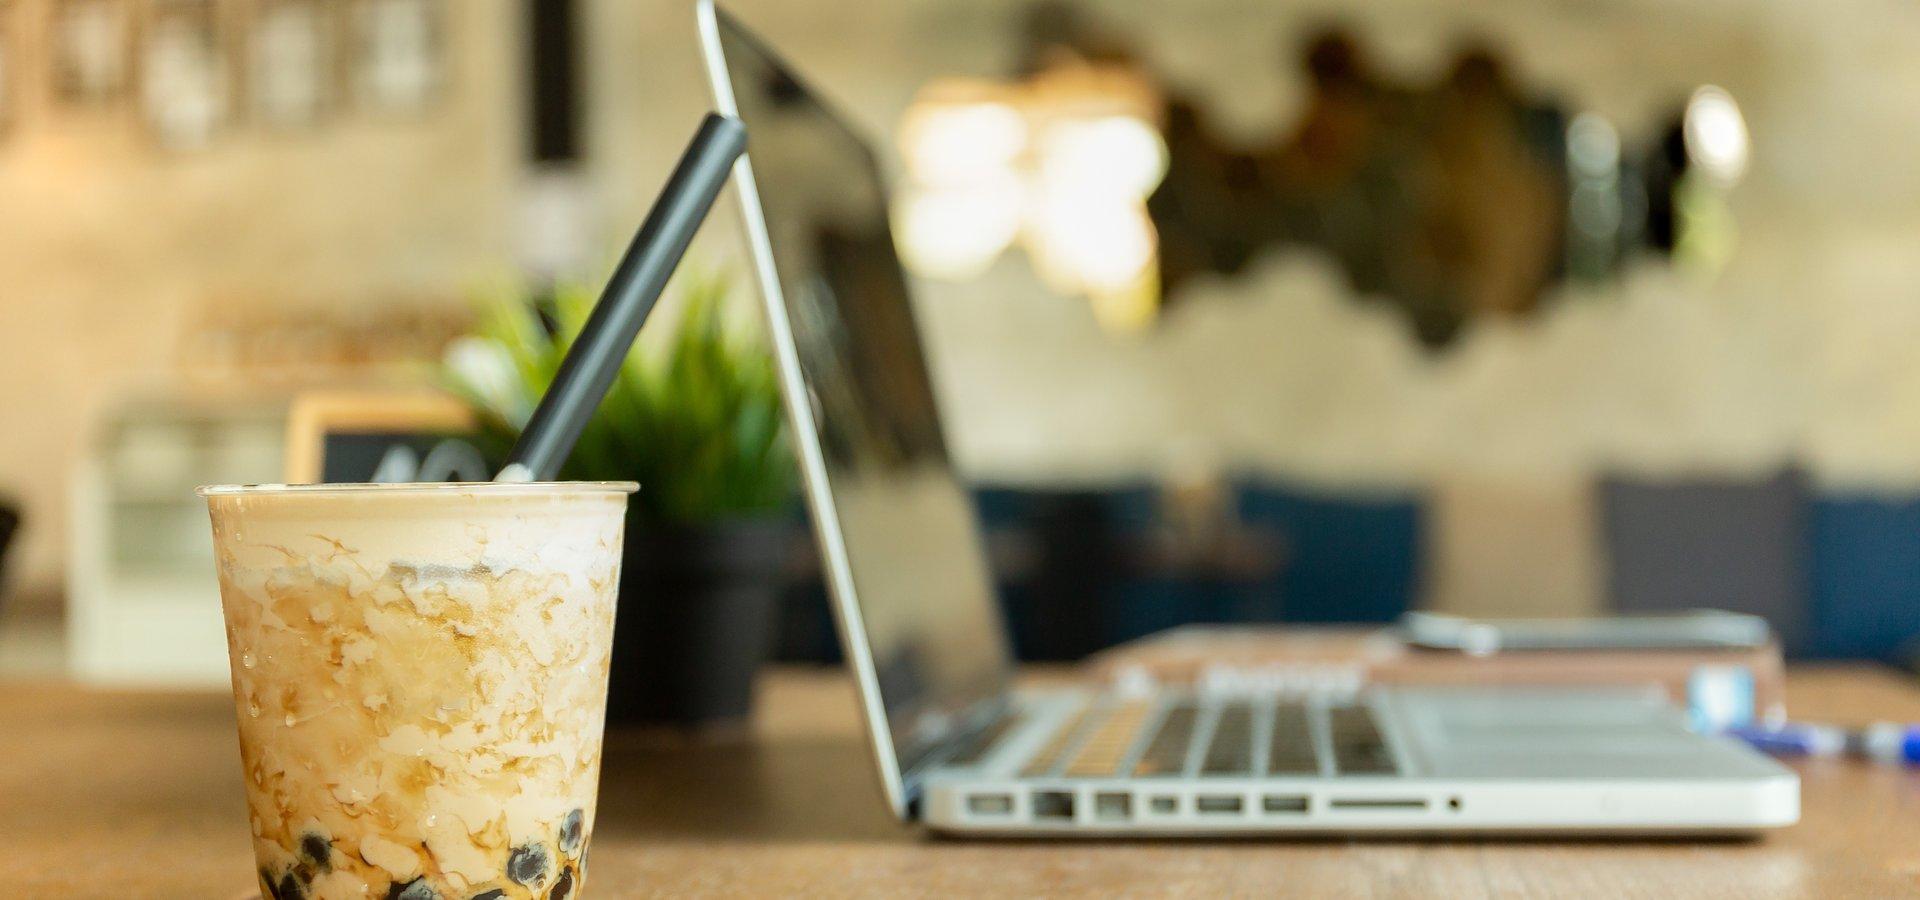 10 IDEAS TO TAKE FROM KOREAN STUDY CAFES